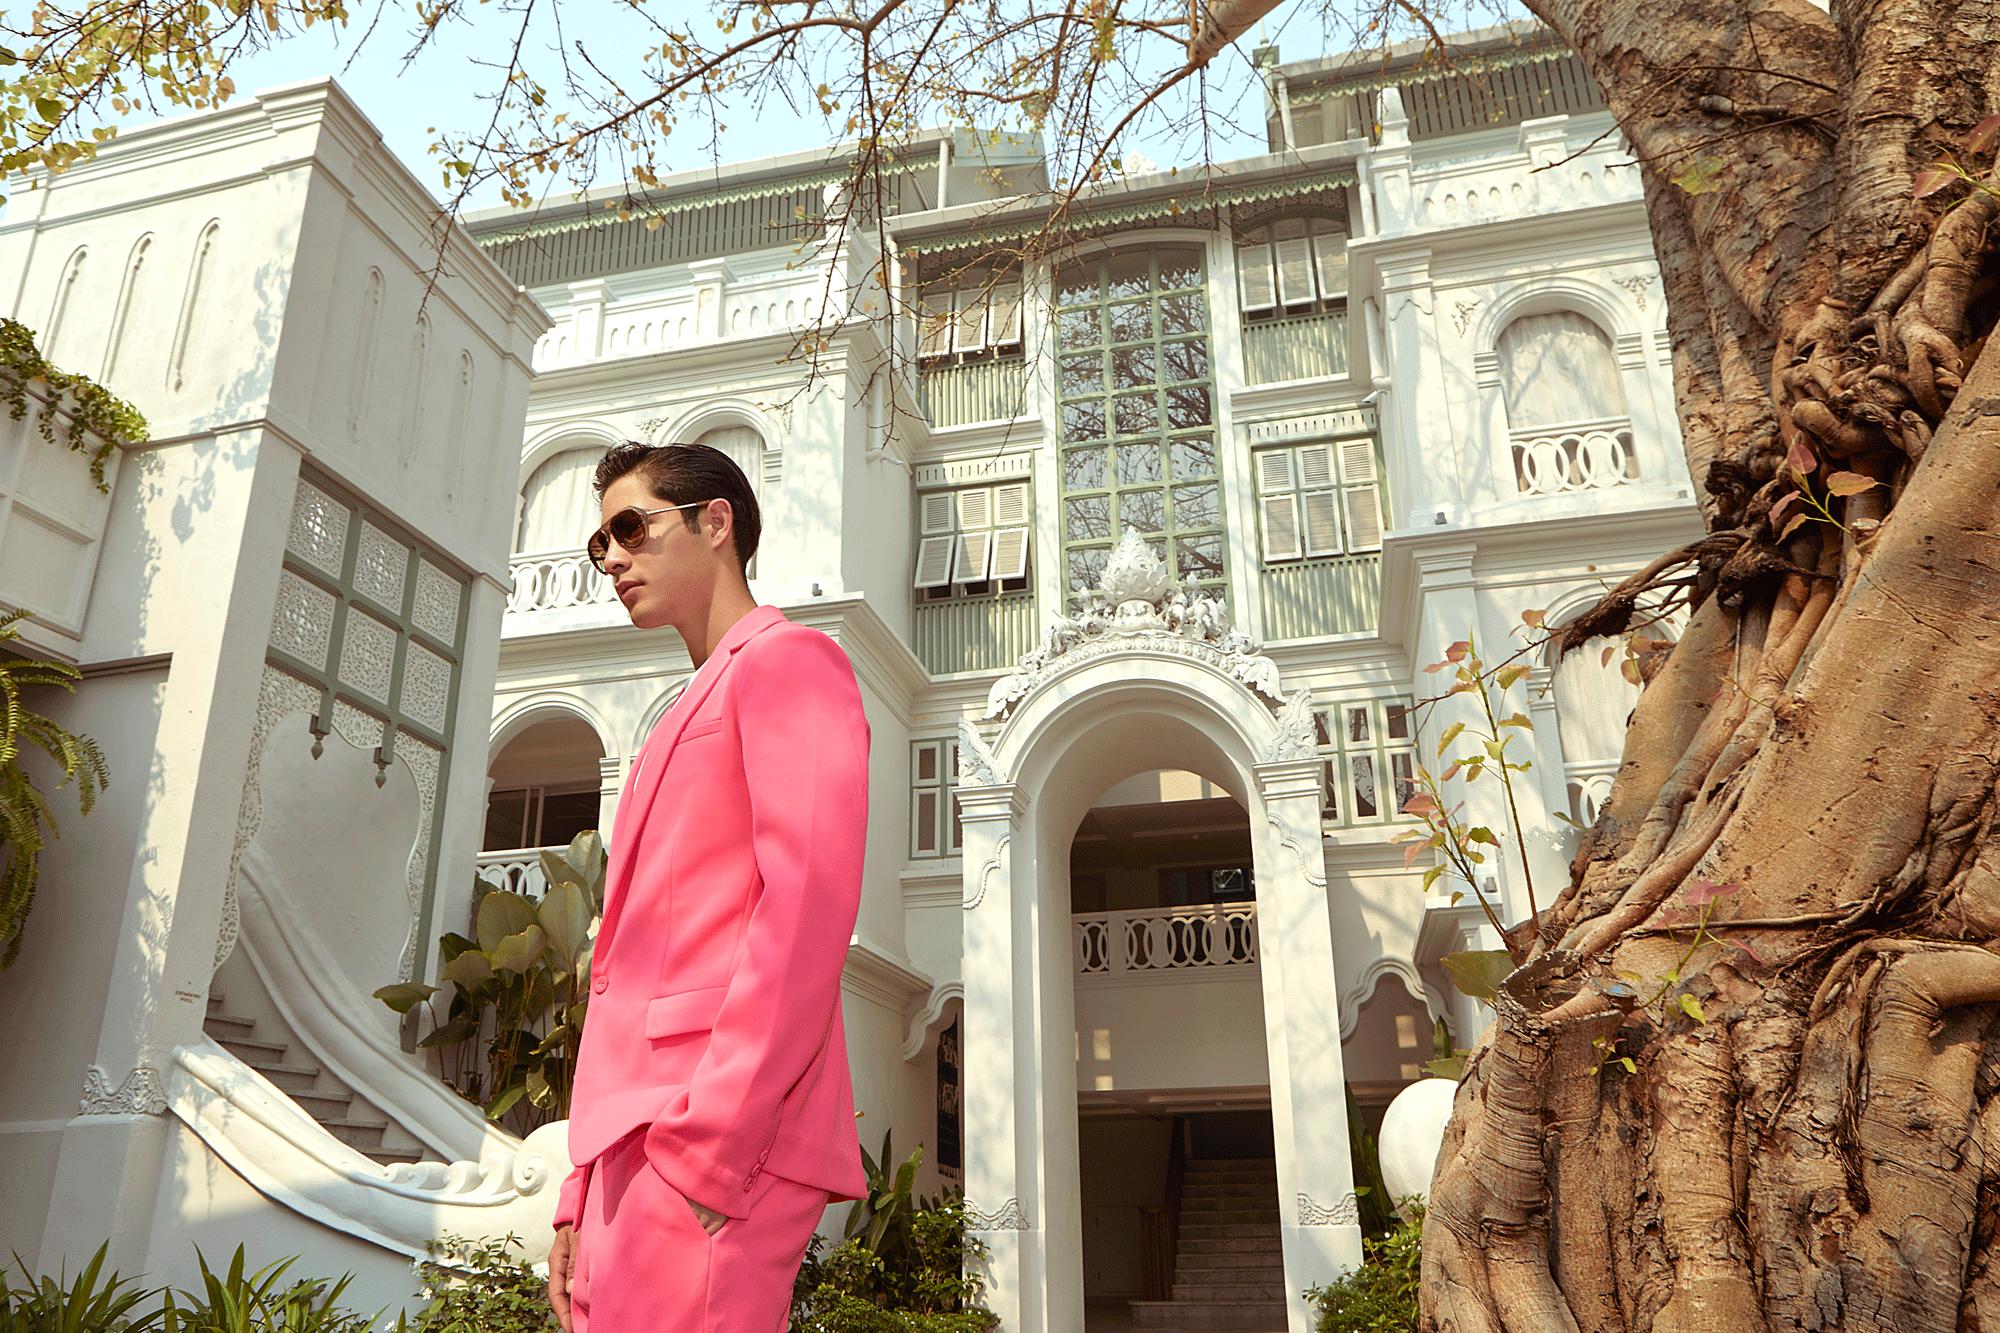 clothes : SARIT / sunglasses : Blake Kuwahara